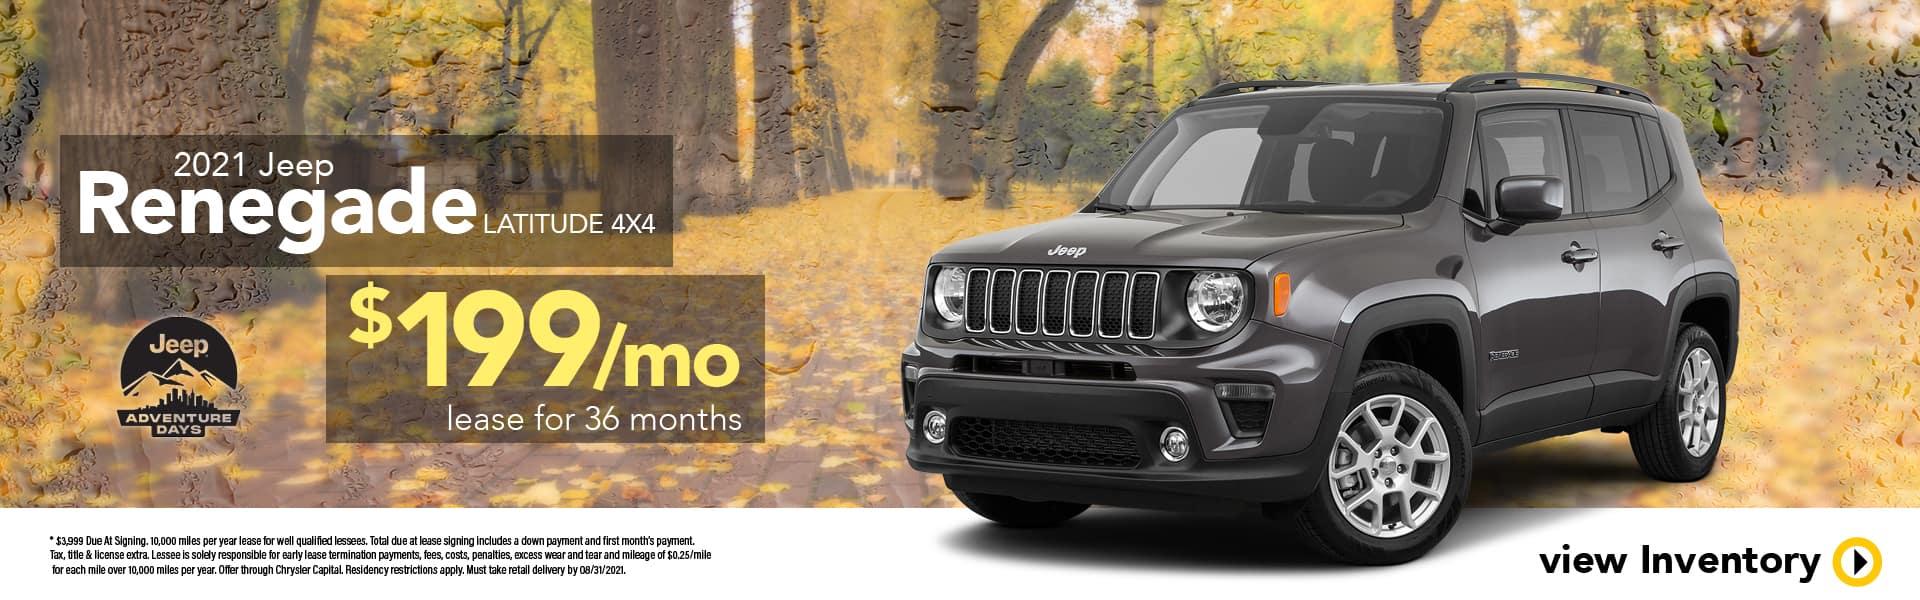 2021 Jeep Renegade Latitude 4x4